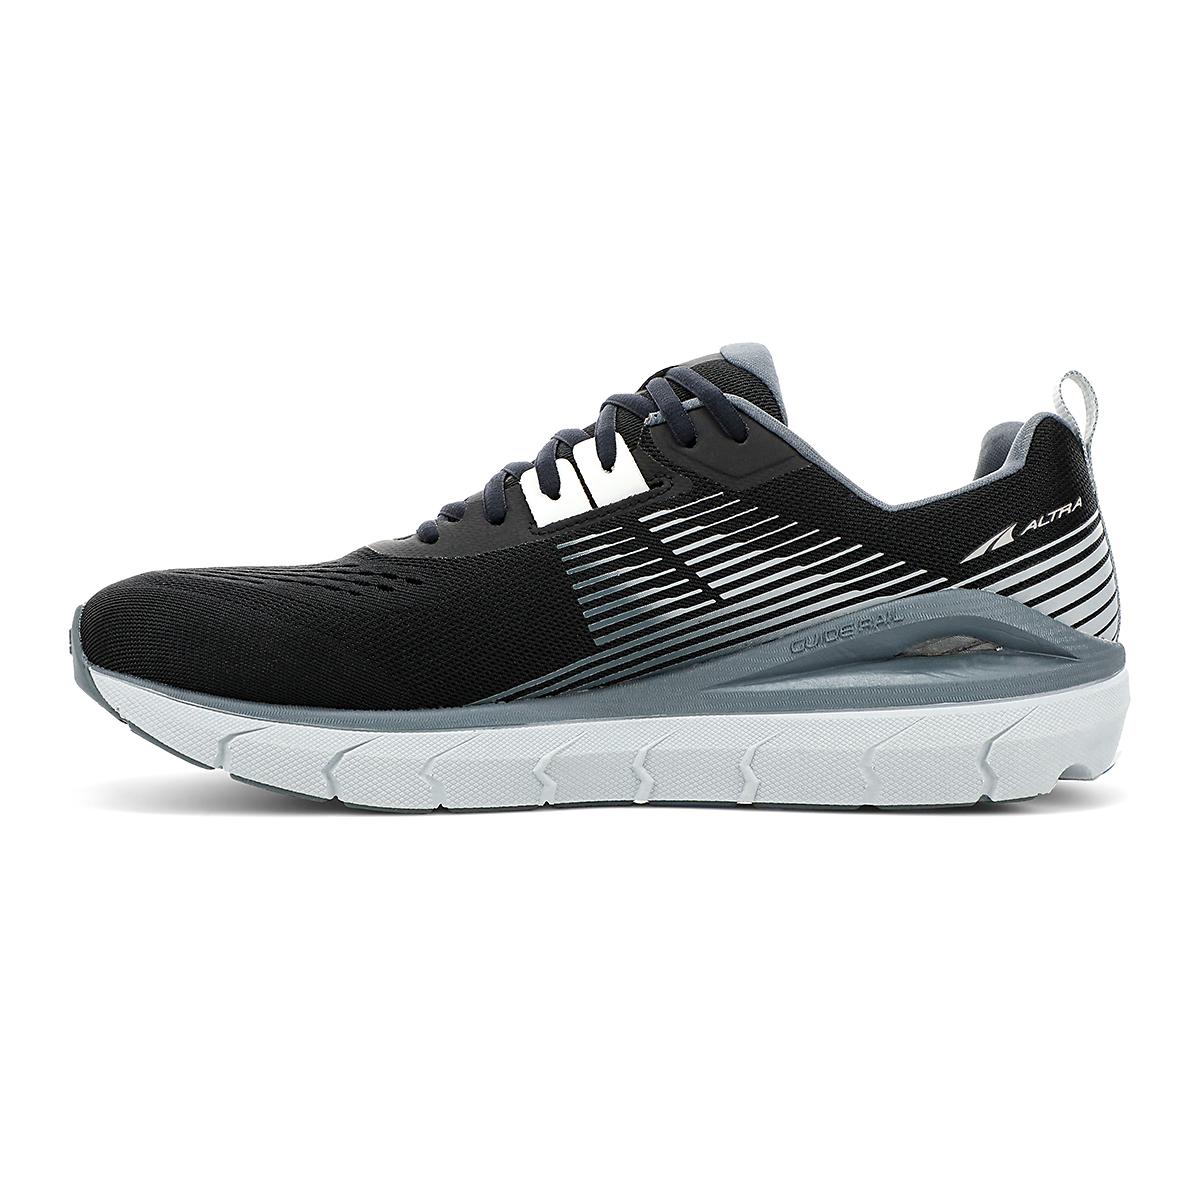 Men's Altra Provision 5 Running Shoe - Color: Black/Gray - Size: 8 - Width: Regular, Black/Gray, large, image 2